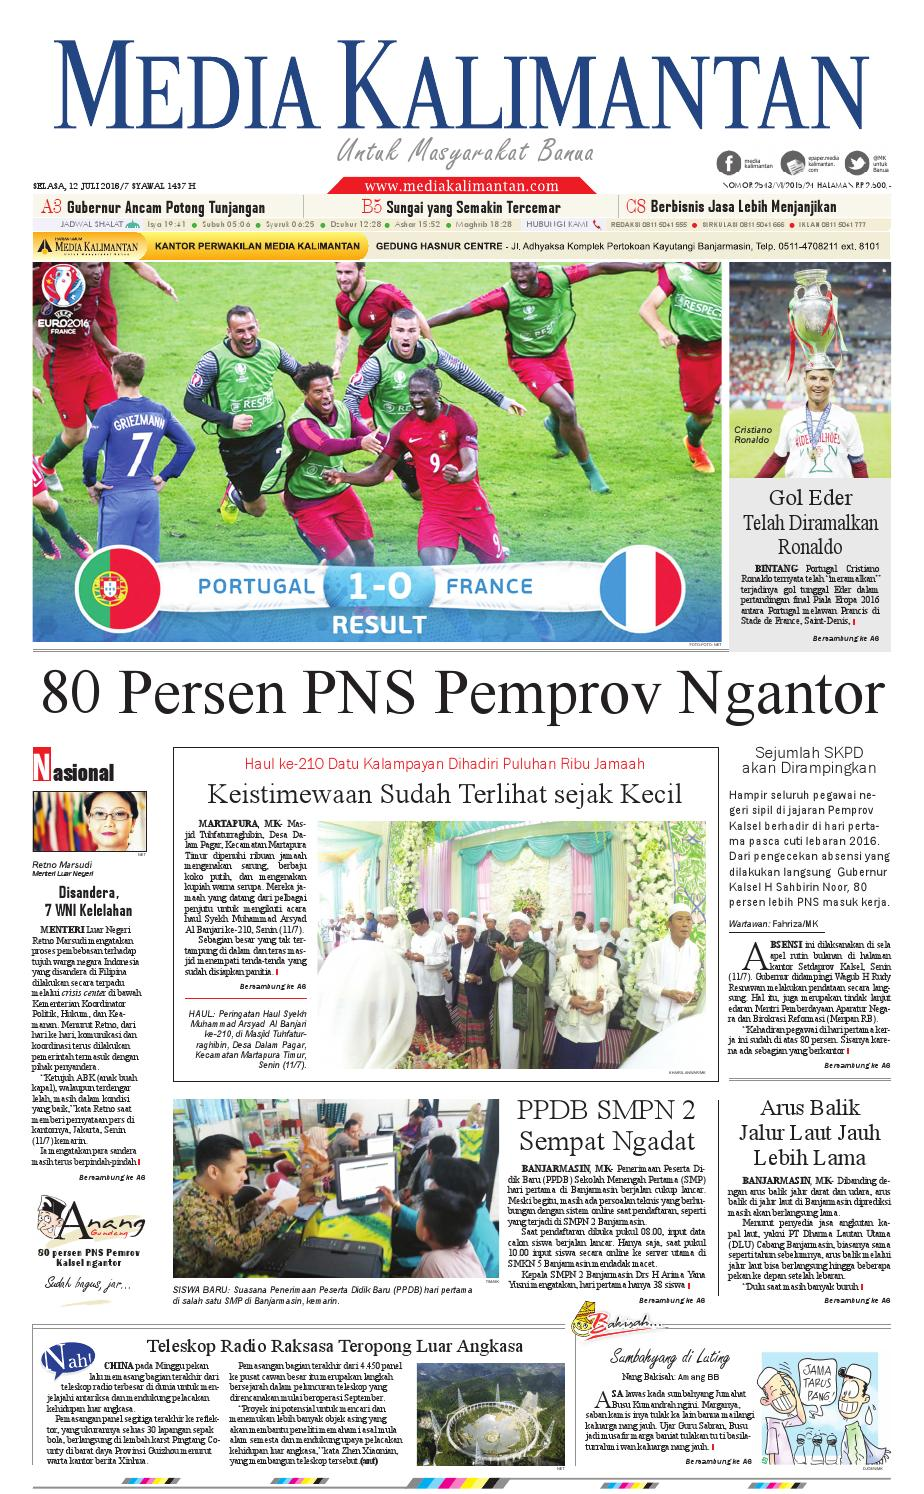 Media Kalimantan Selasa 12 Juli 2016 By Issuu Produk Ukm Bumn Tenun Pagatan Atasan Wanita 4